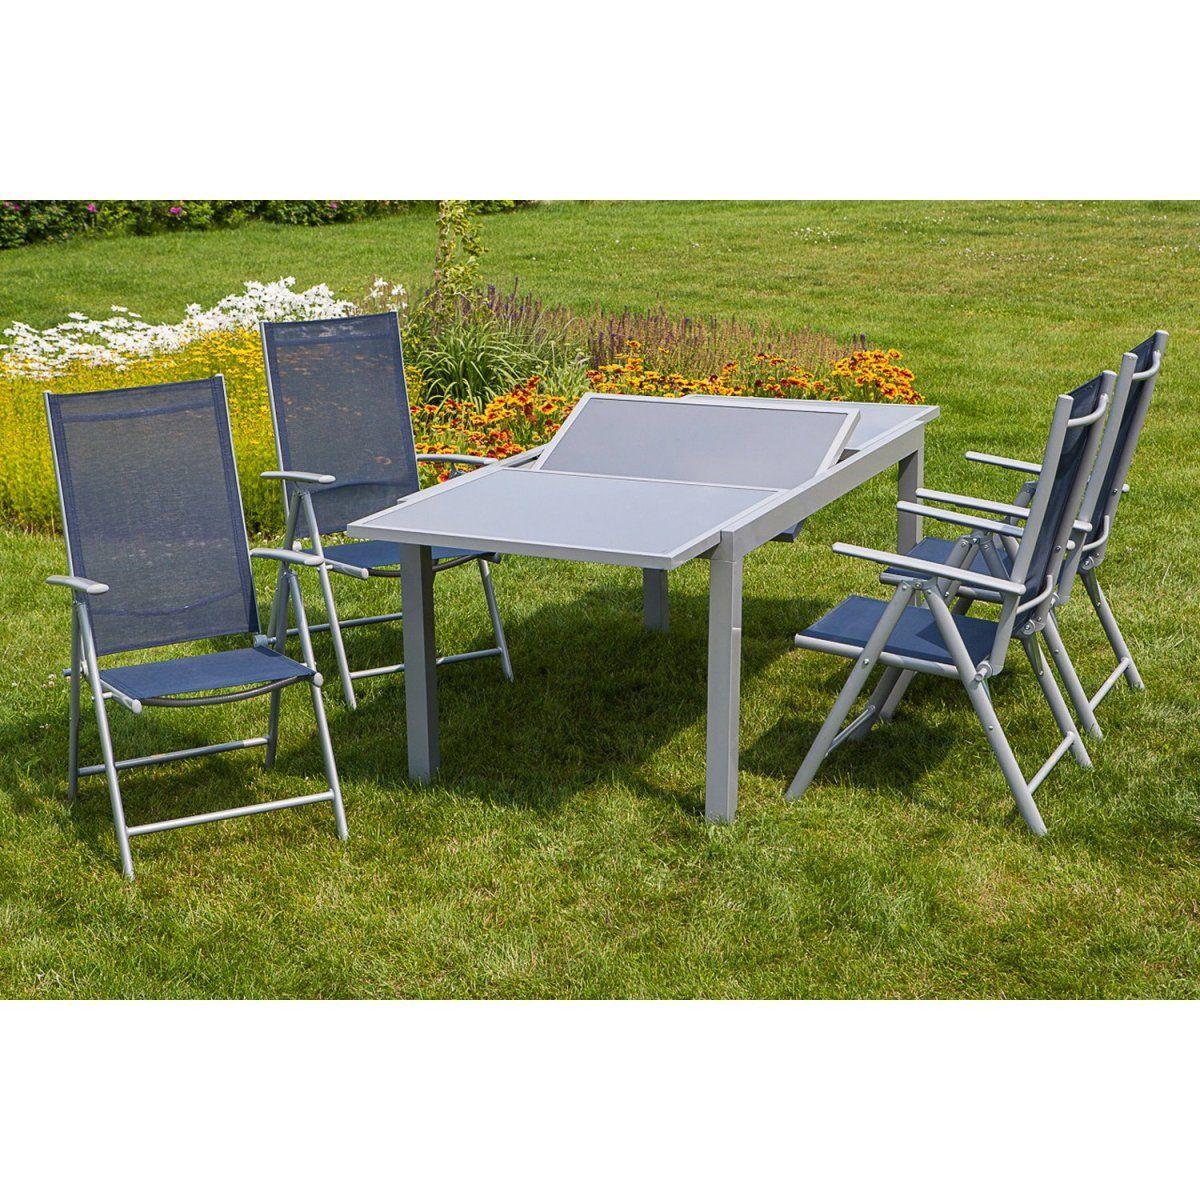 Gartenmöbel-Set Amalfi 5-tlg. Marineblau inkl. Tisch 150/200 cm x 90 ...